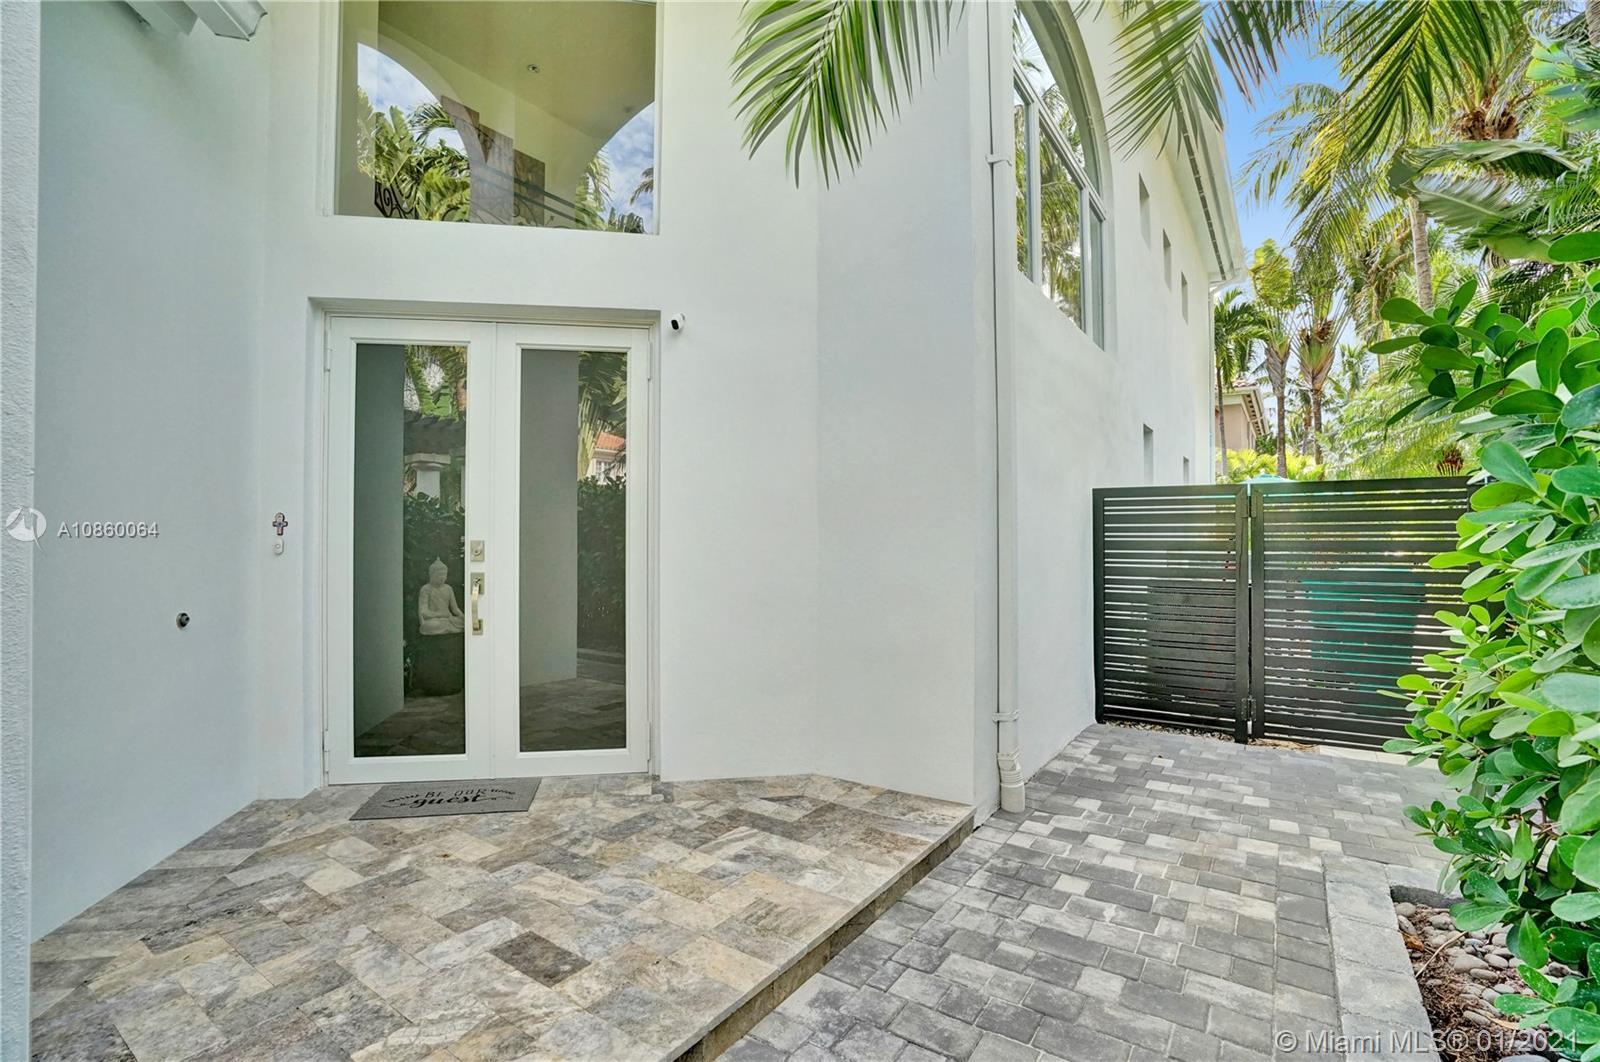 Photo of 3936 194th Trl, Sunny Isles Beach, Florida, 33160 -